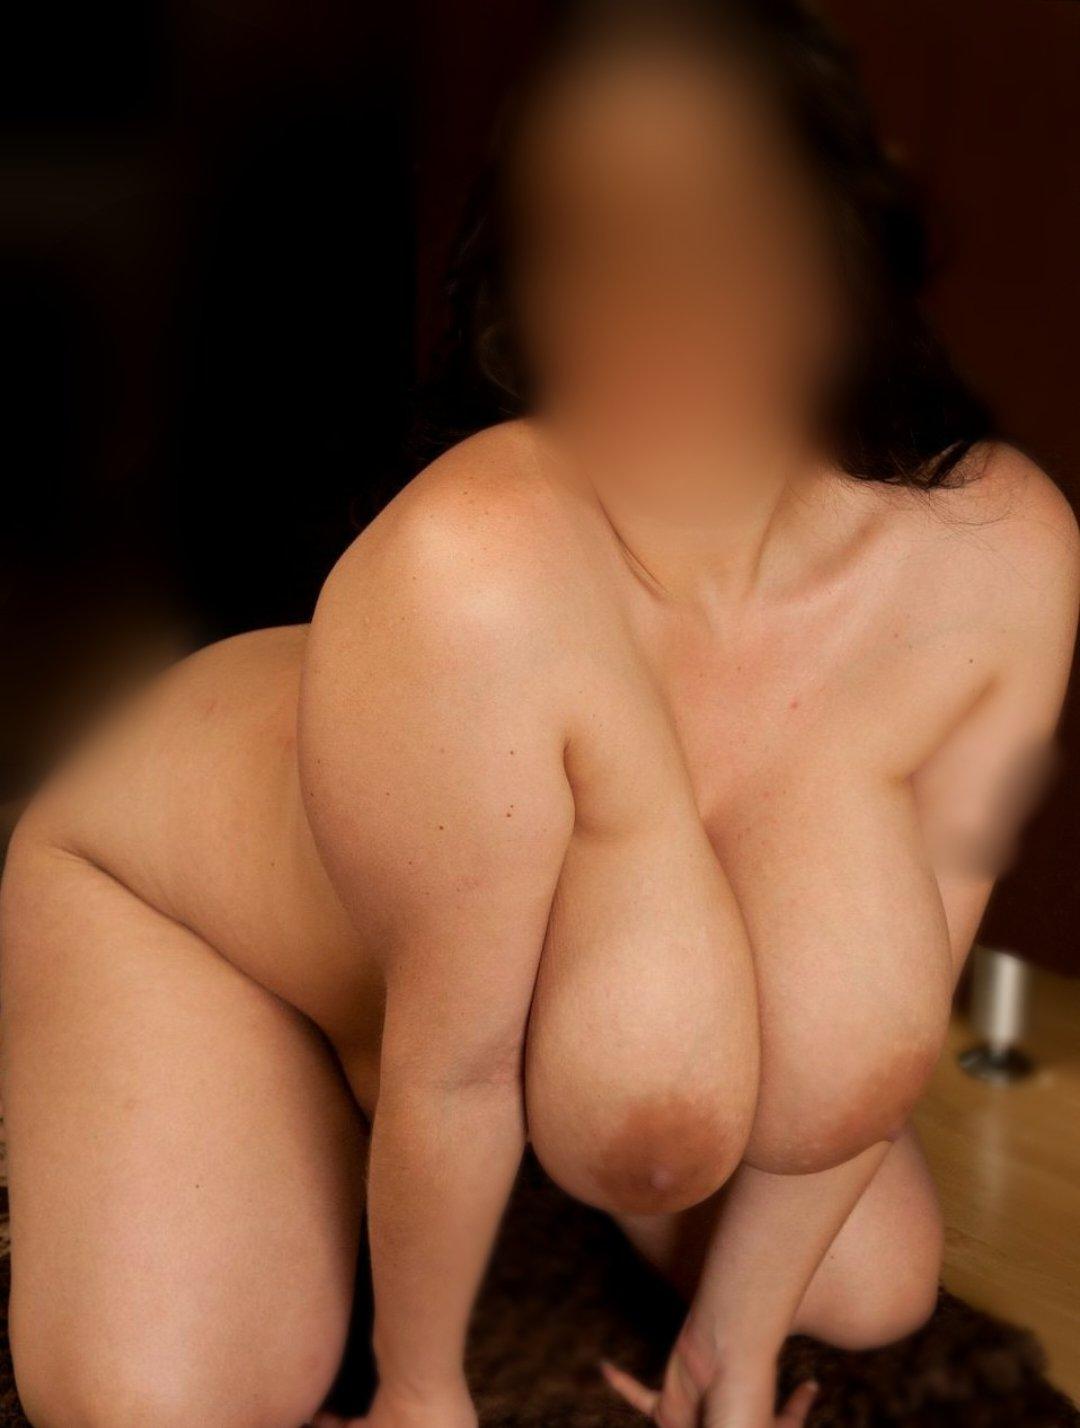 Erotick sluby - Sluby a remesl - Nov Hrady-Nov Hrady